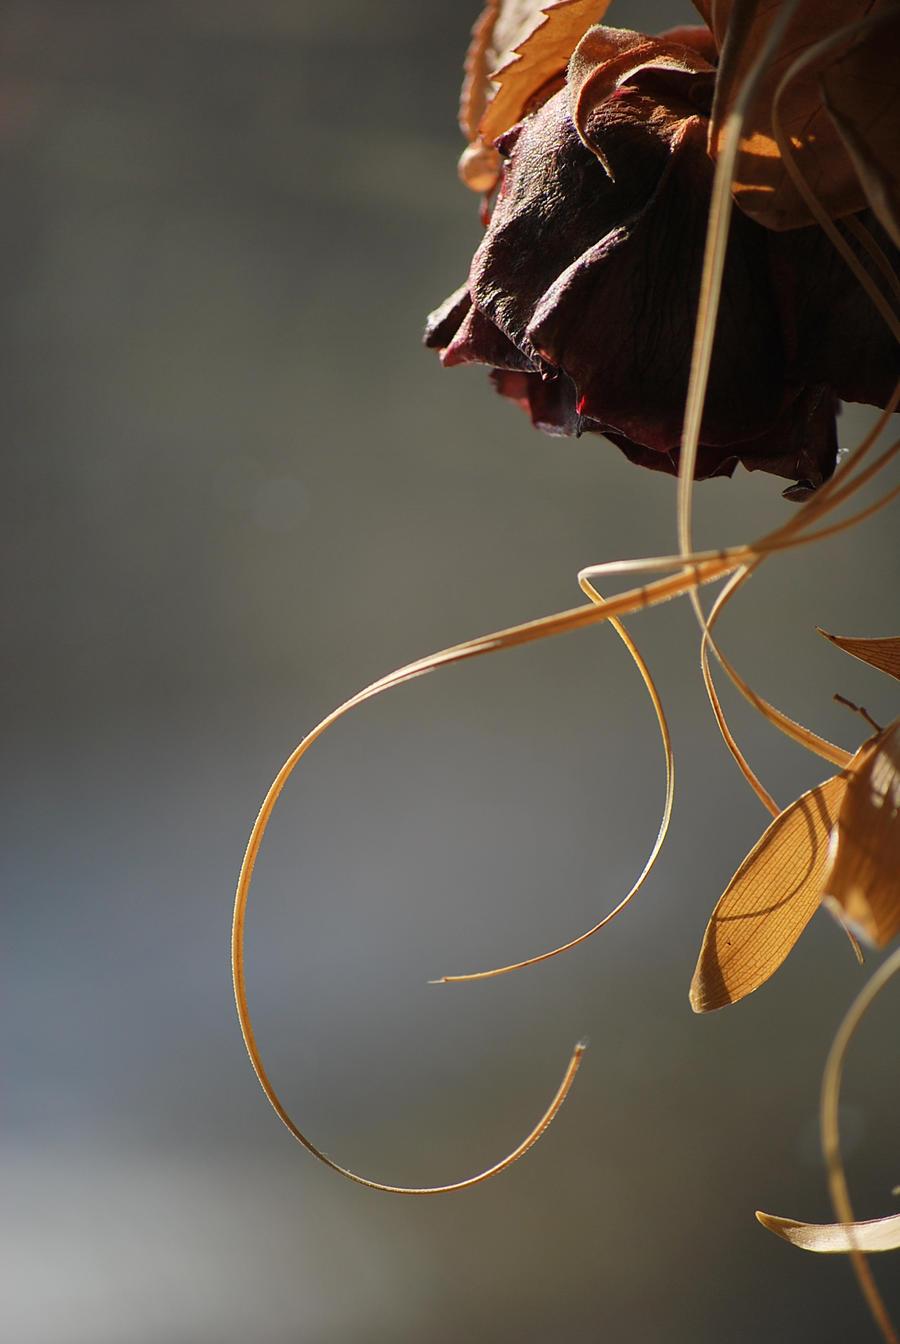 Sunlit rose by Antivuskning